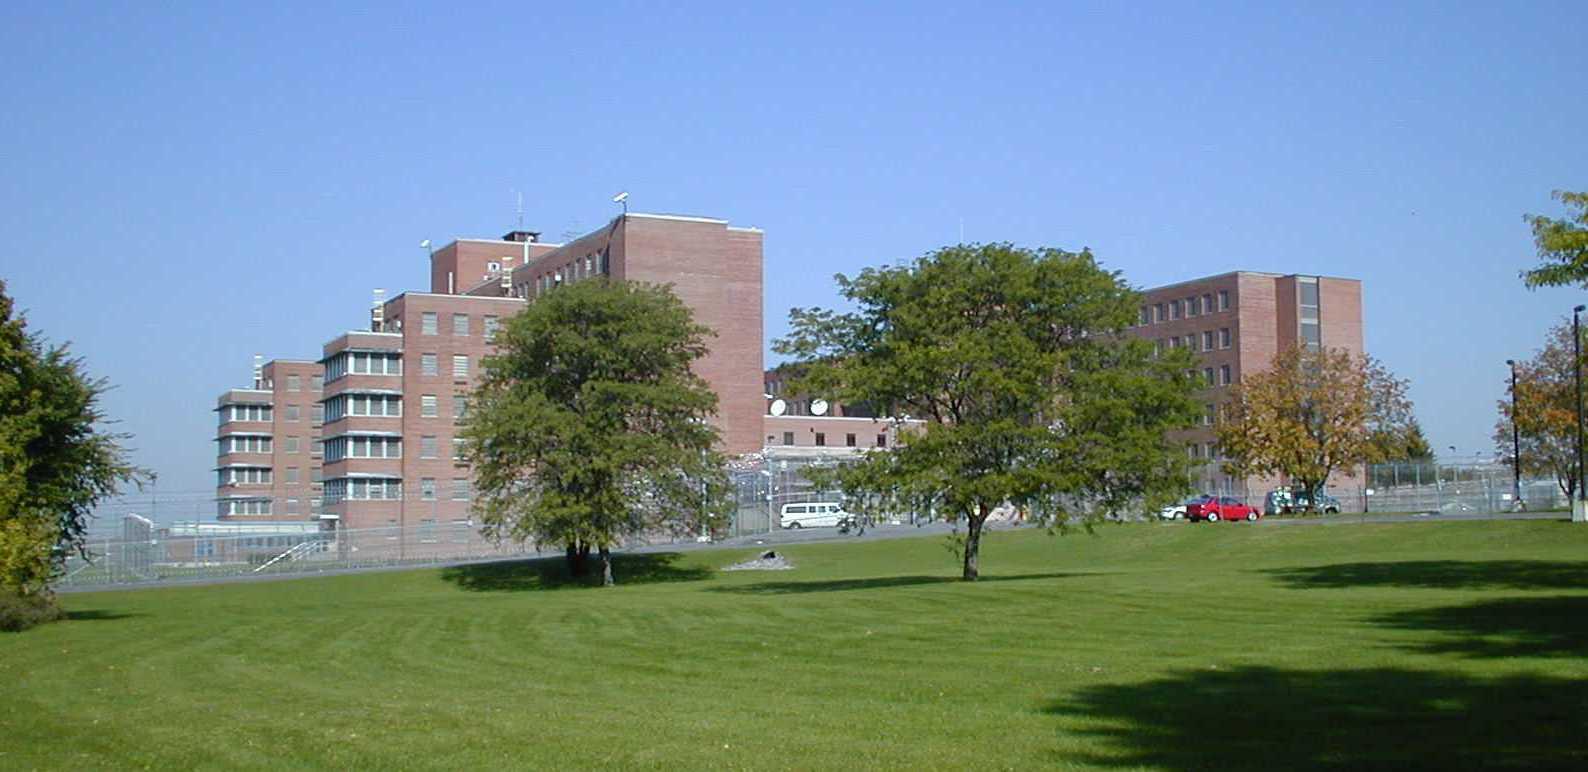 Central New York Psychiatric Center